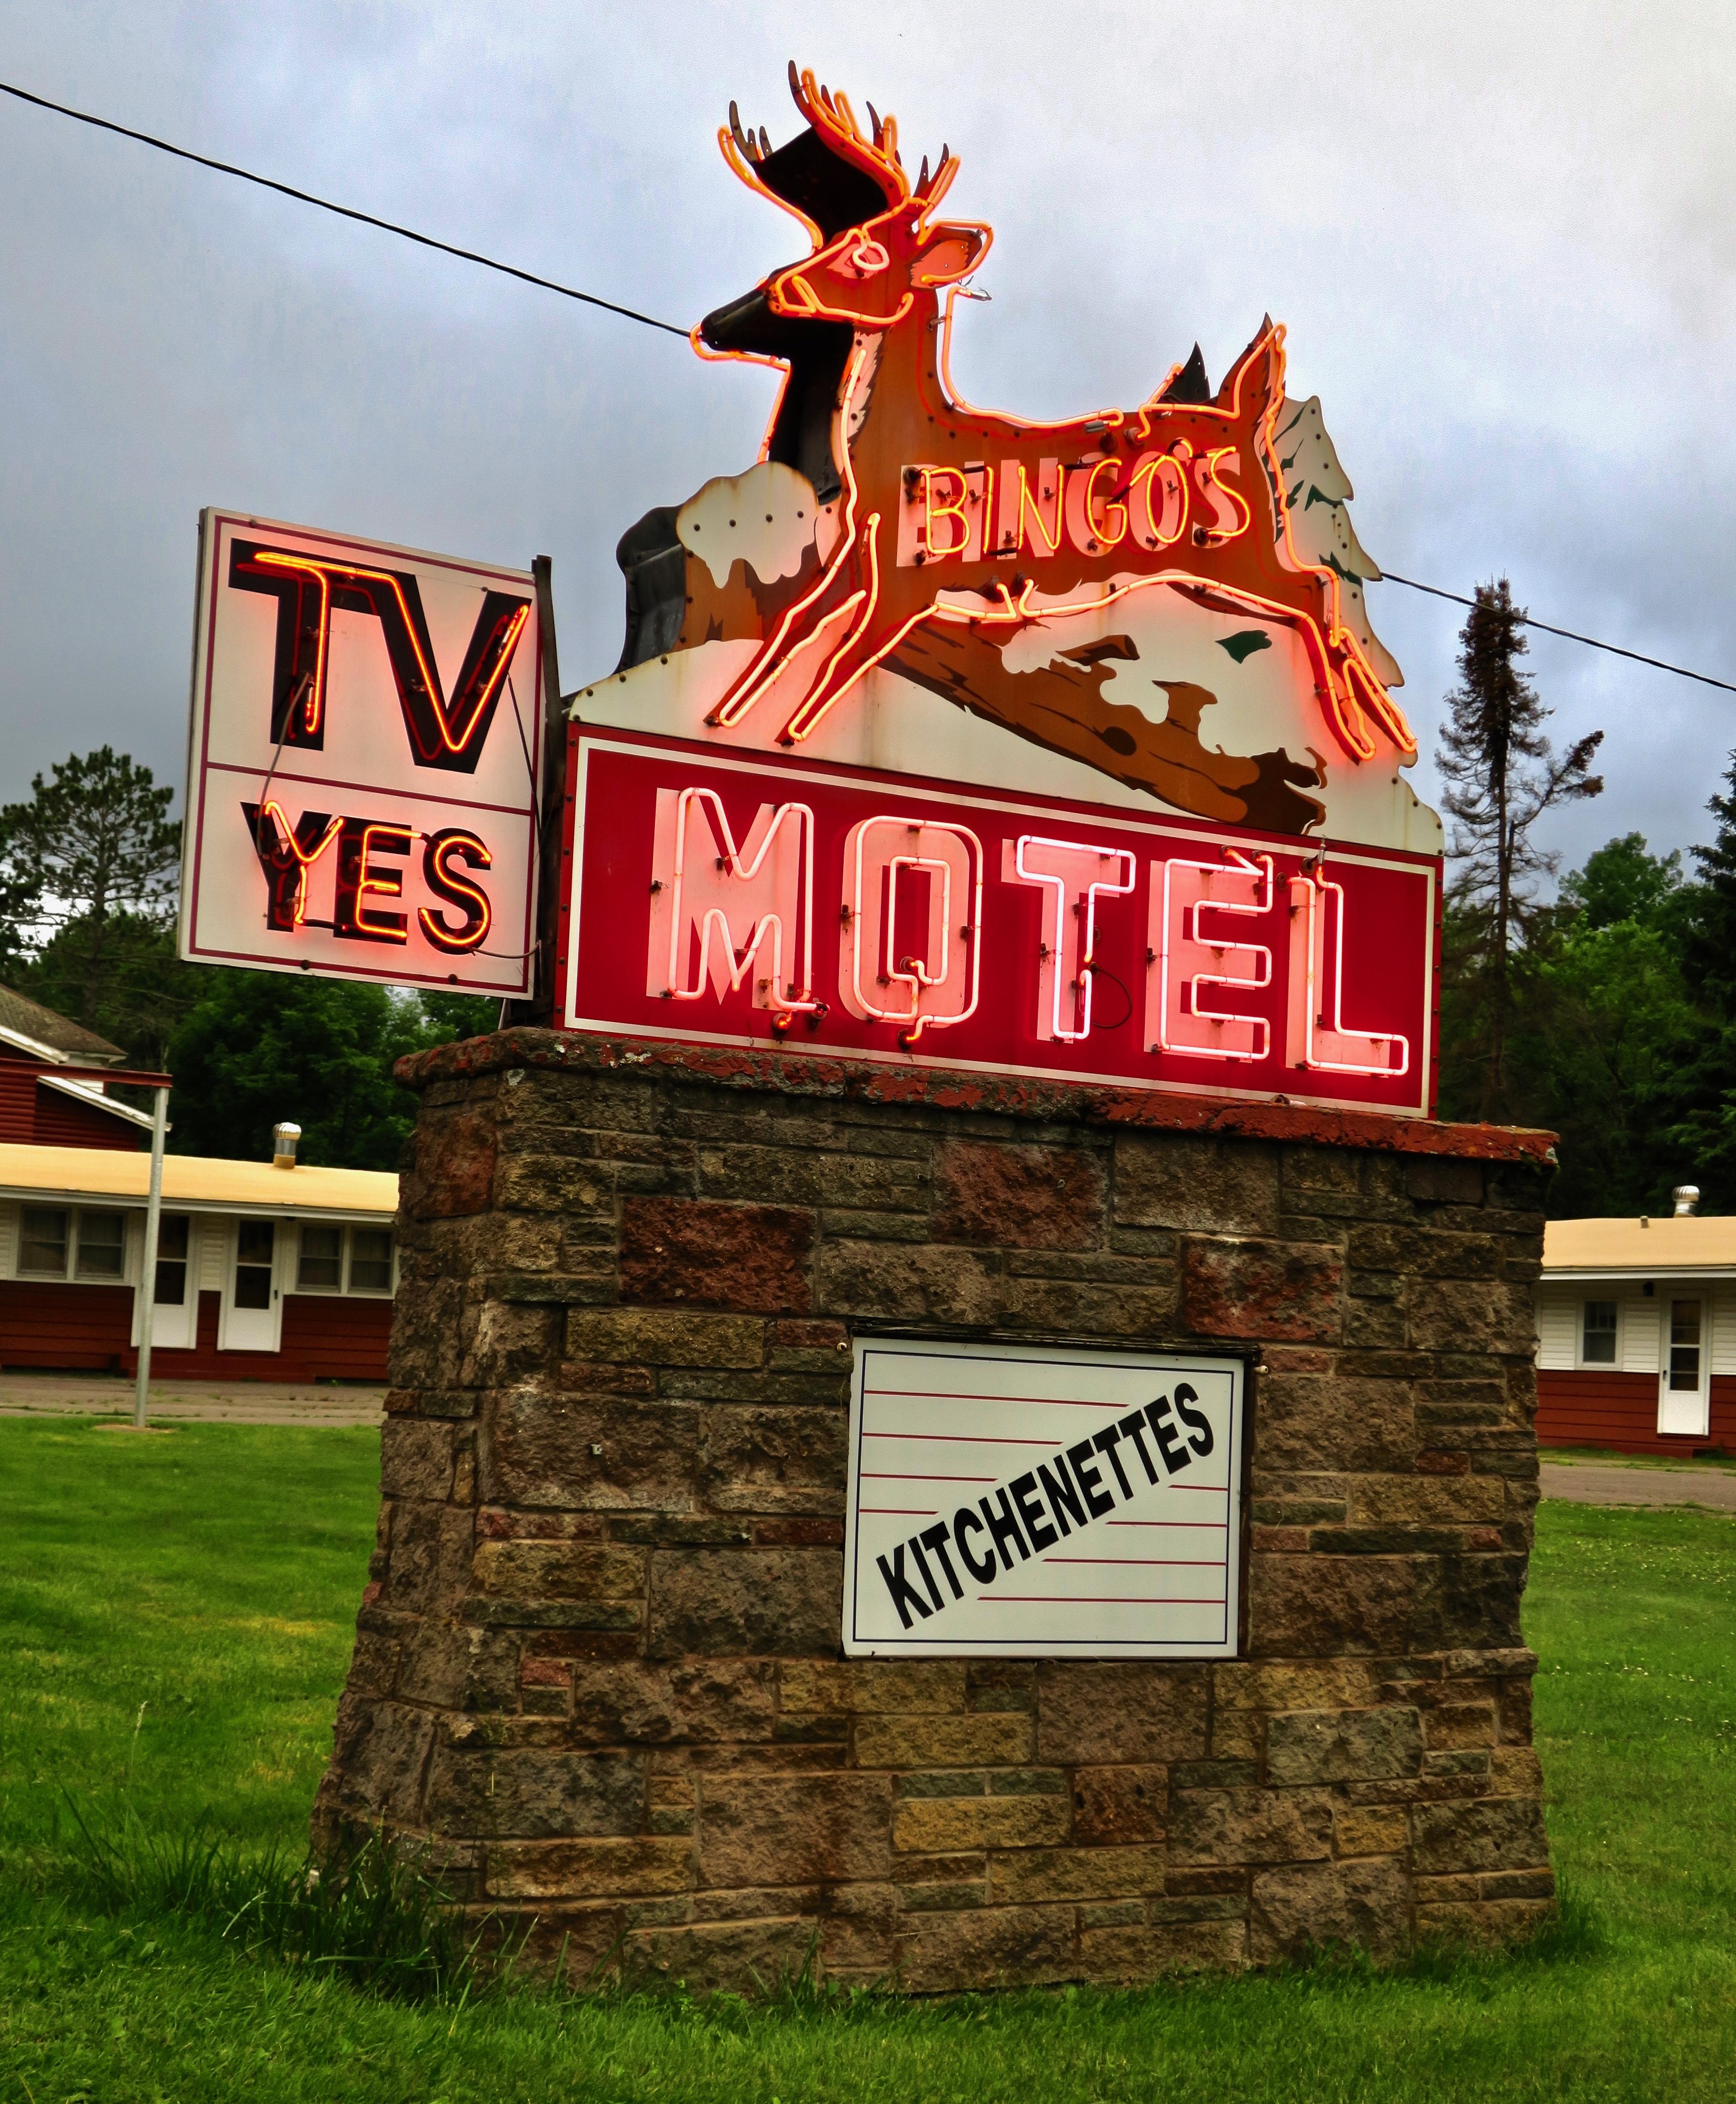 Bingo's Motel - 180 Michigan 28, Wakefield, Michigan U.S.A. - June 30, 2017